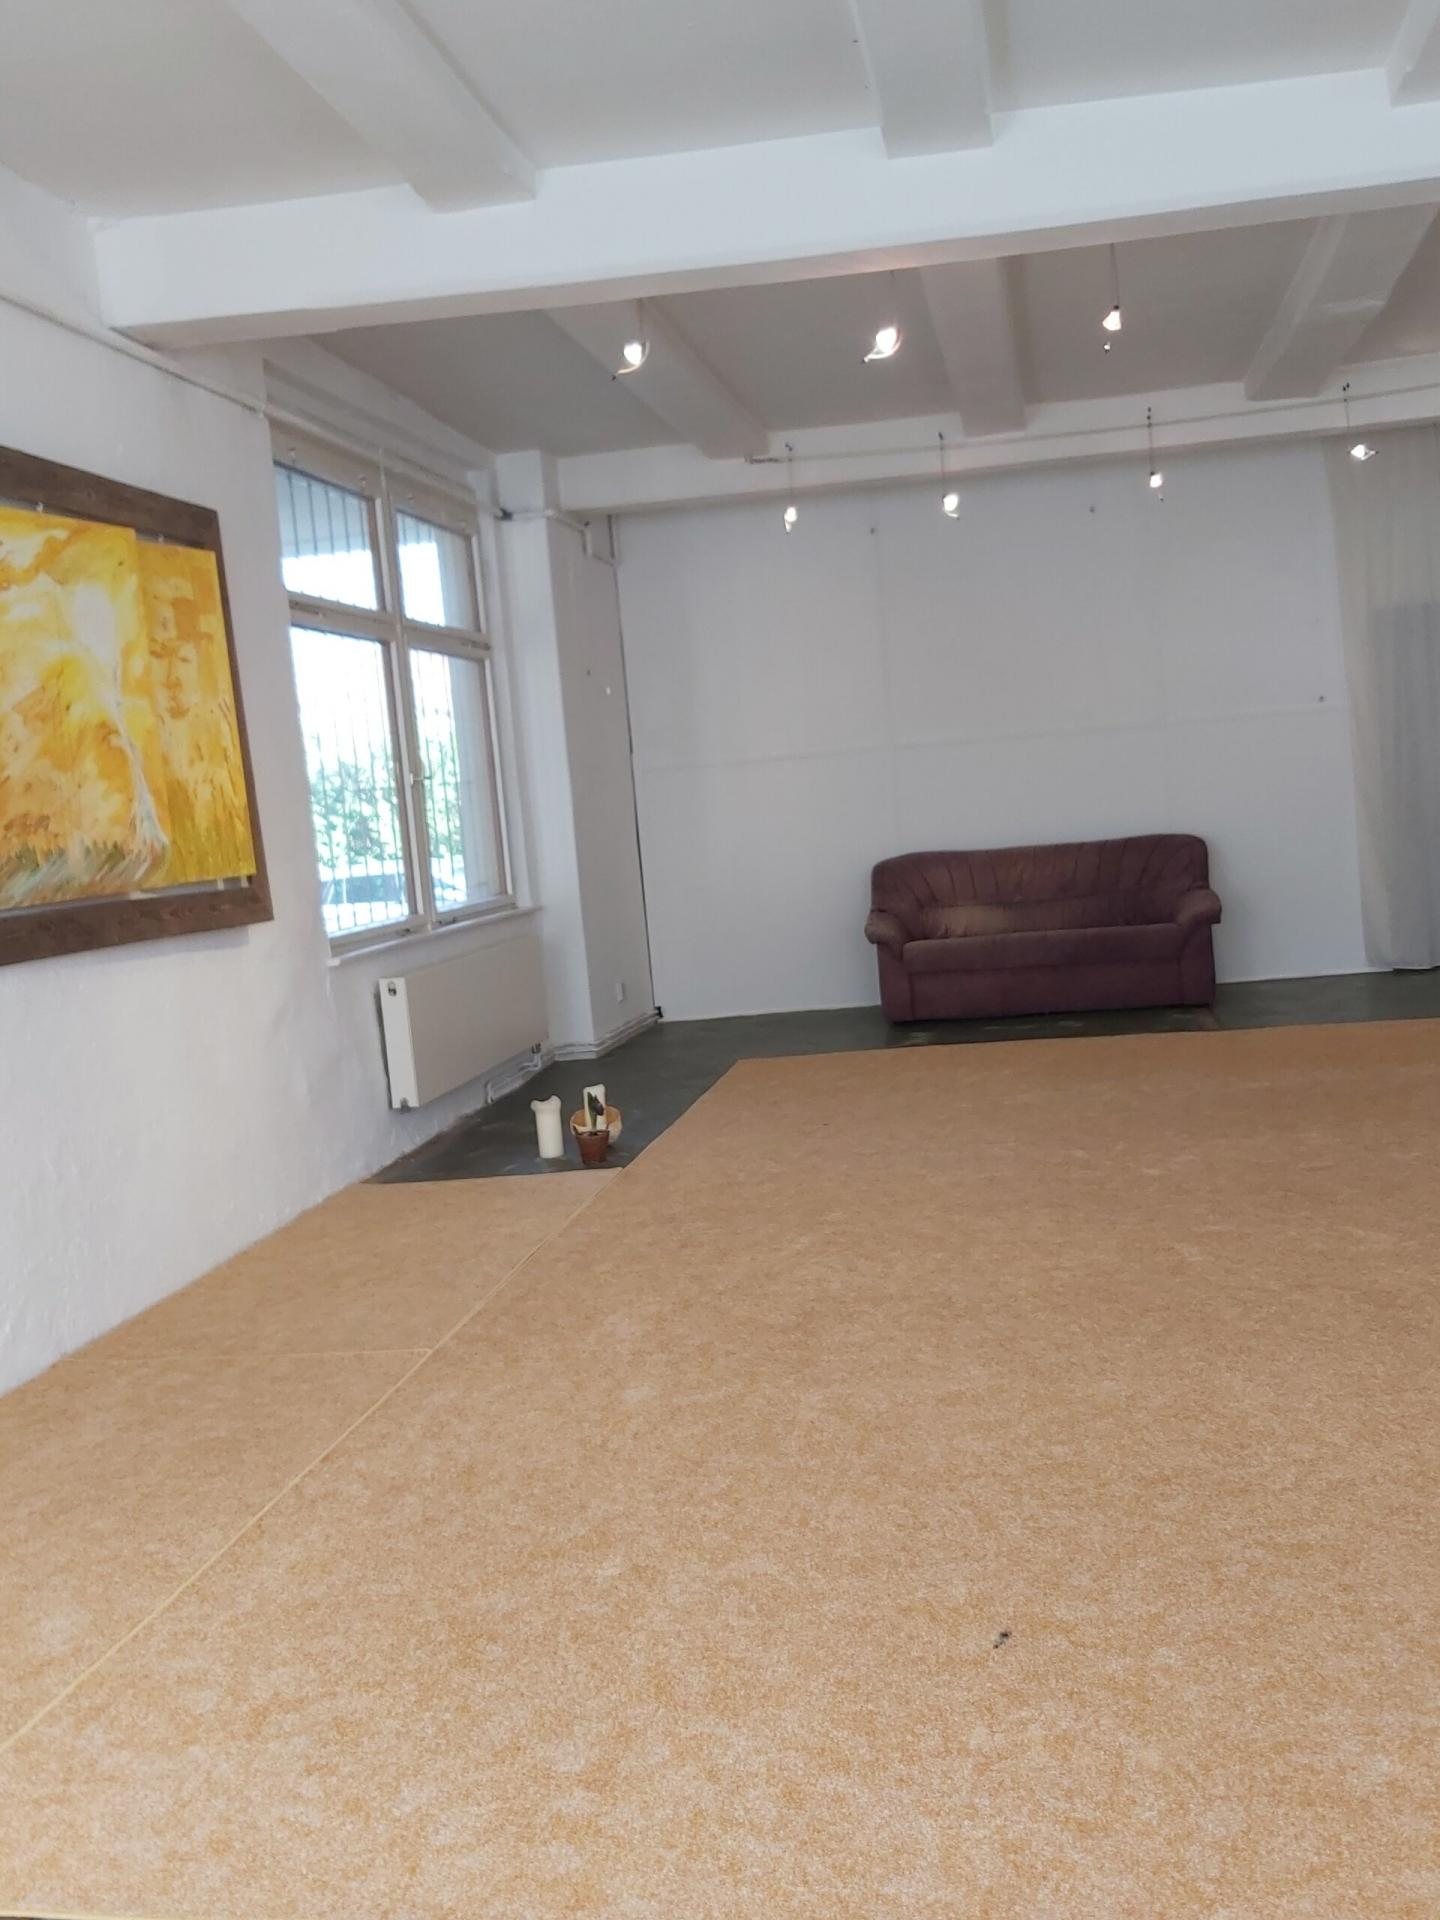 Seminarraum oder Galerie